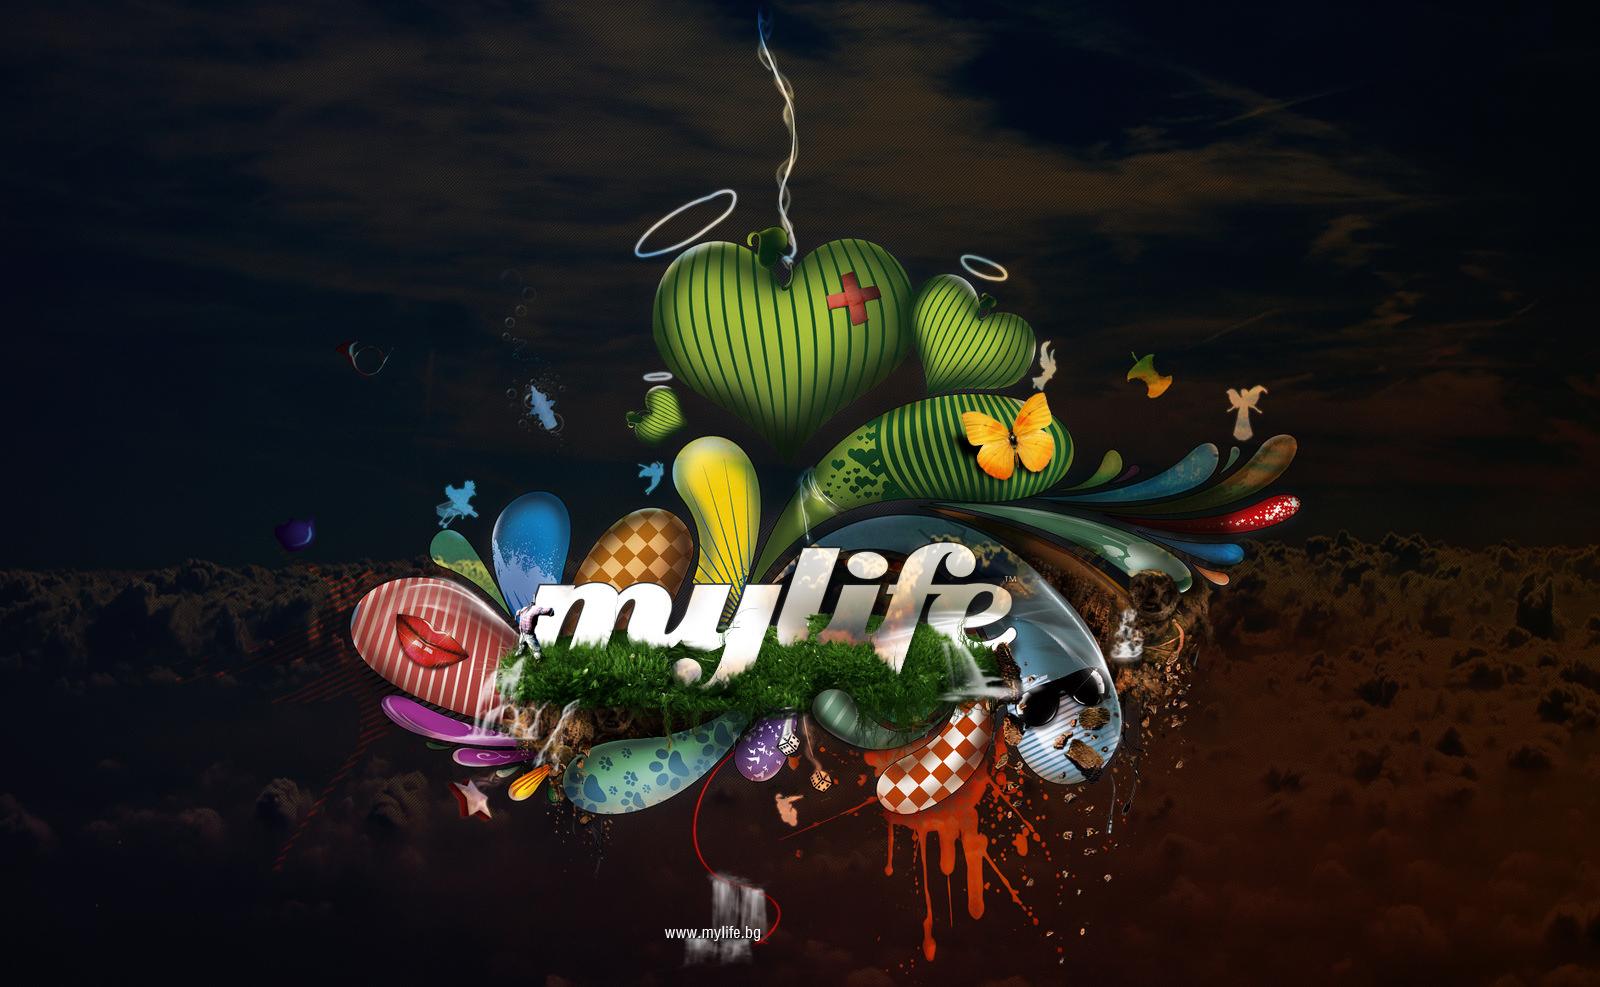 http://3.bp.blogspot.com/-AFWnI_84eLg/TaKBEboLW2I/AAAAAAAAAFM/CHRPo0ZnWb8/s1600/my_life_magazine_wallpaper_by_CHIN2OFF.jpg